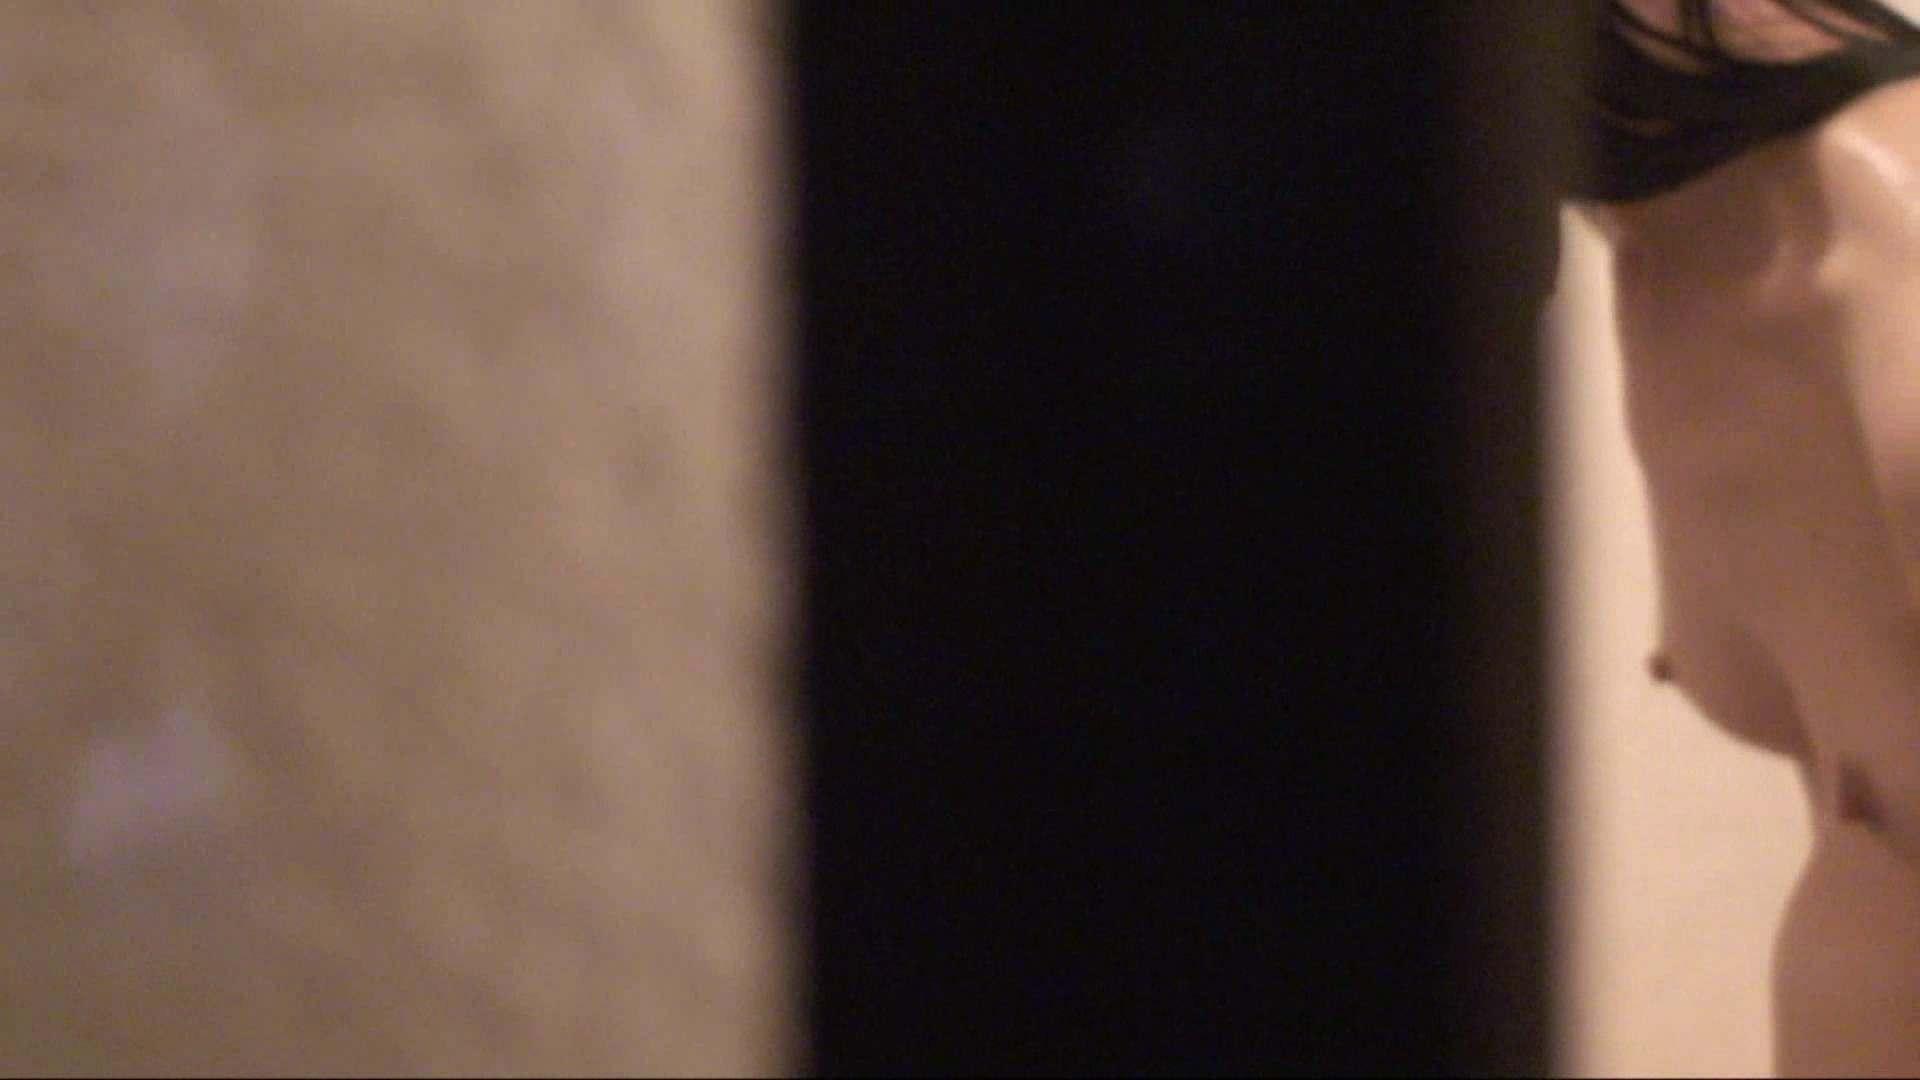 vol.01必見!白肌嬢の乳首が丸見え。極上美人のすっぴん顔をハイビジョンで! 盗撮 濡れ場動画紹介 21pic 16